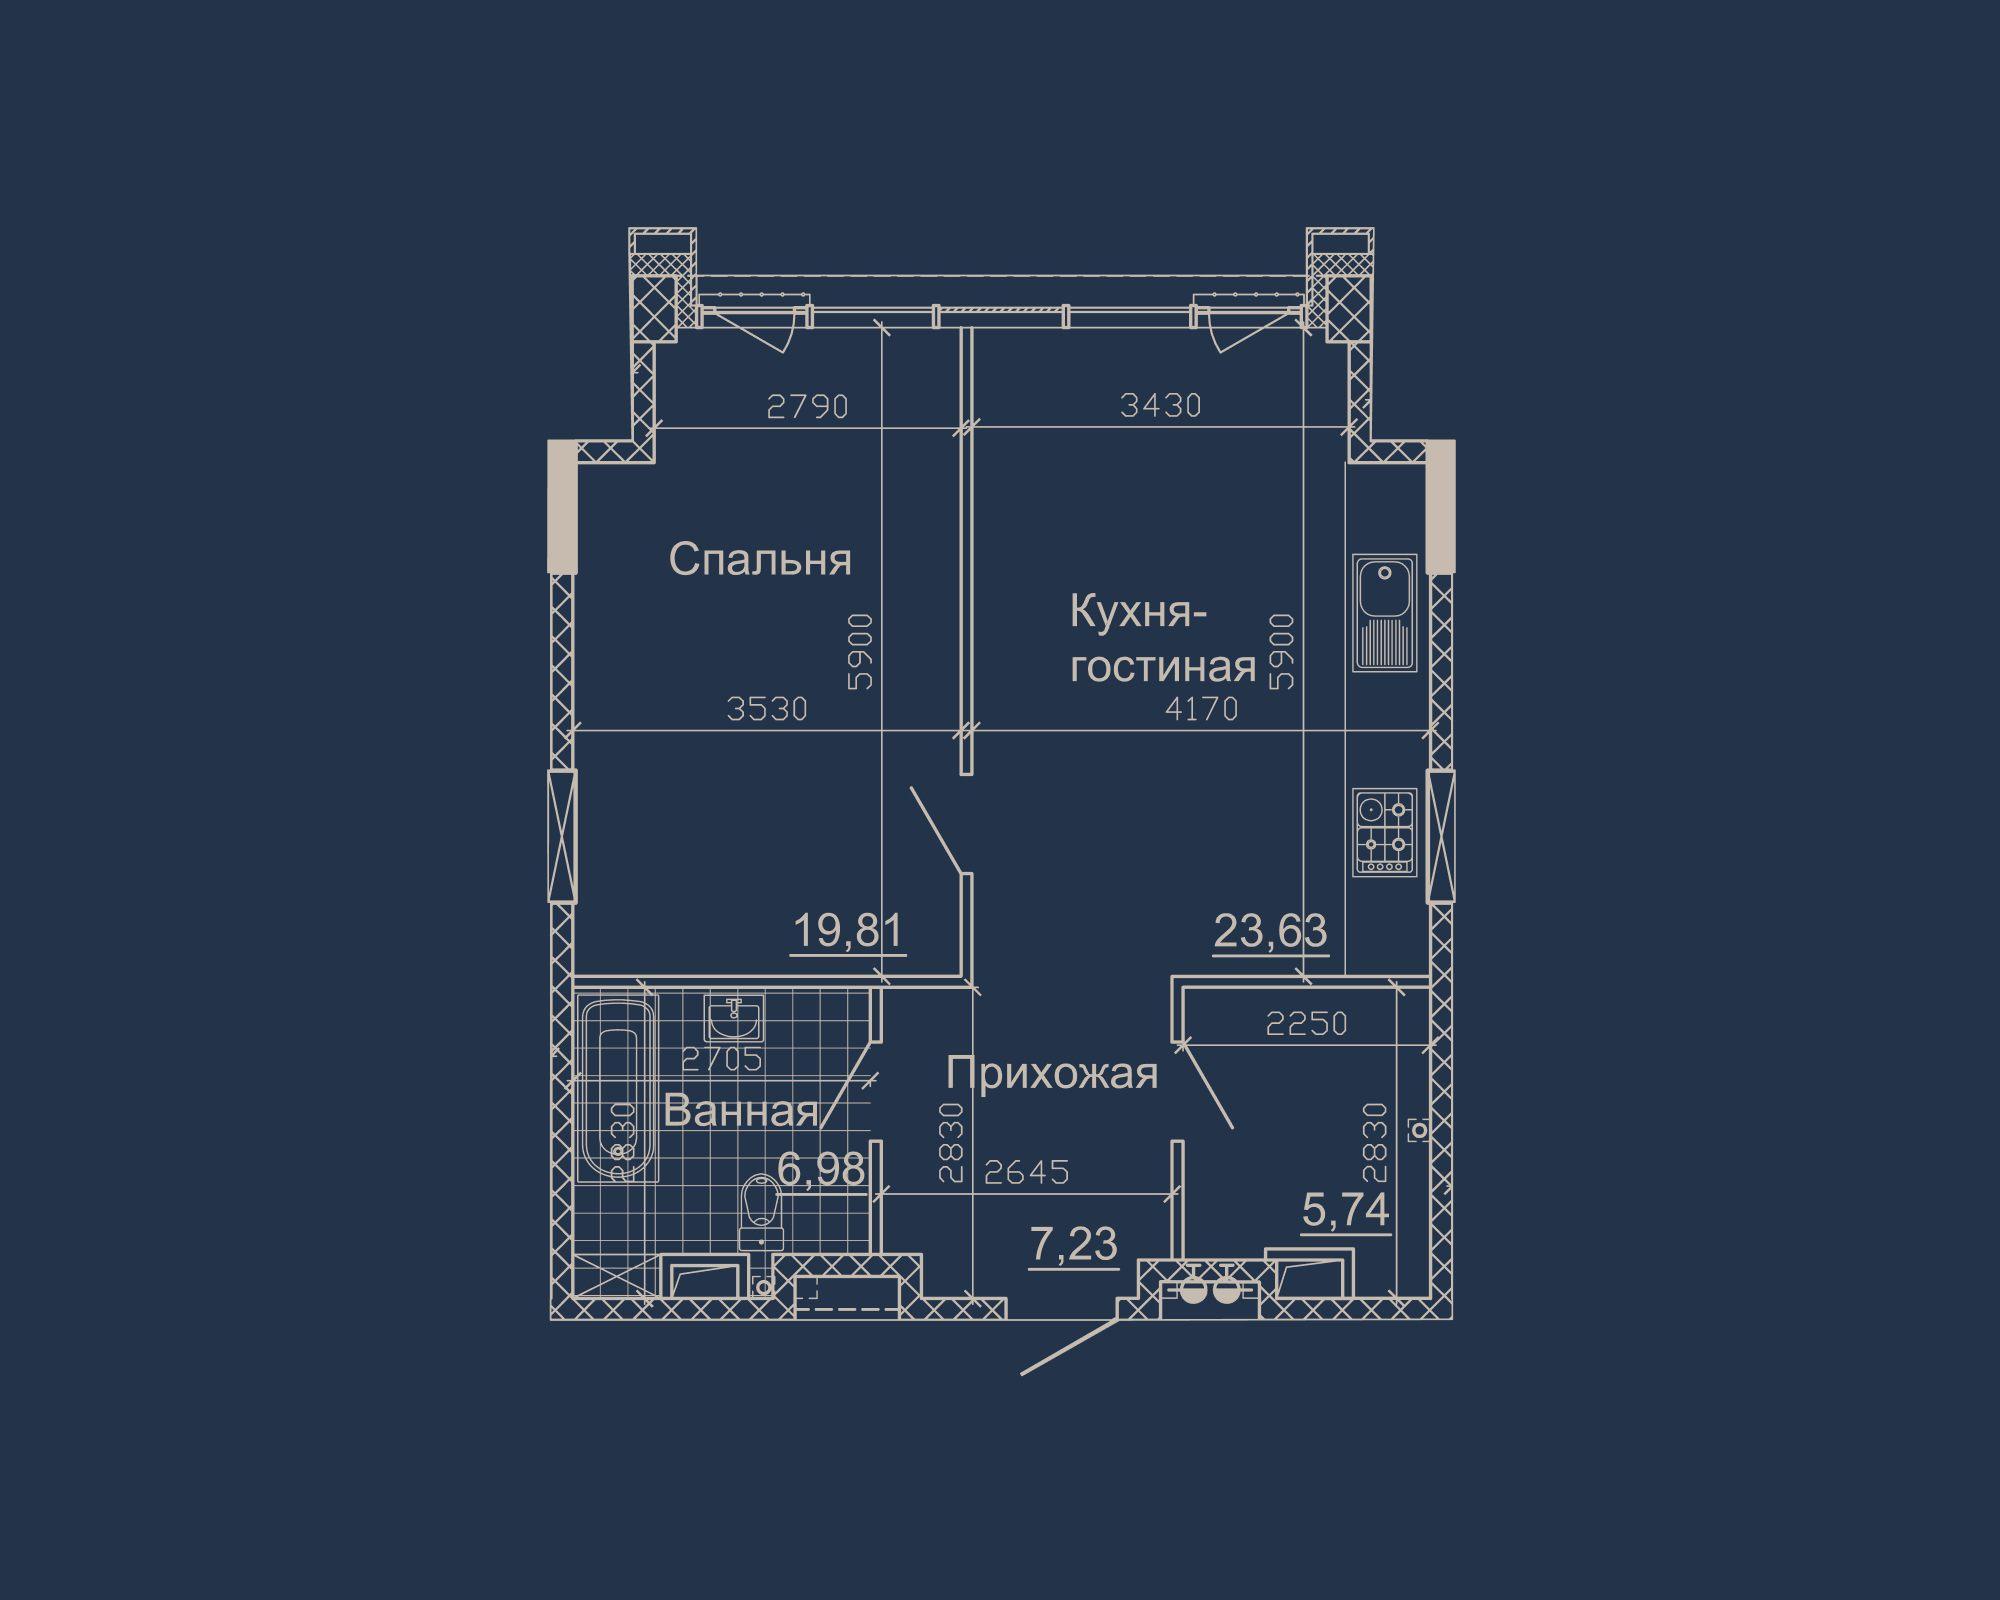 1-кімнатна квартира типу 05А у ЖК Nebo